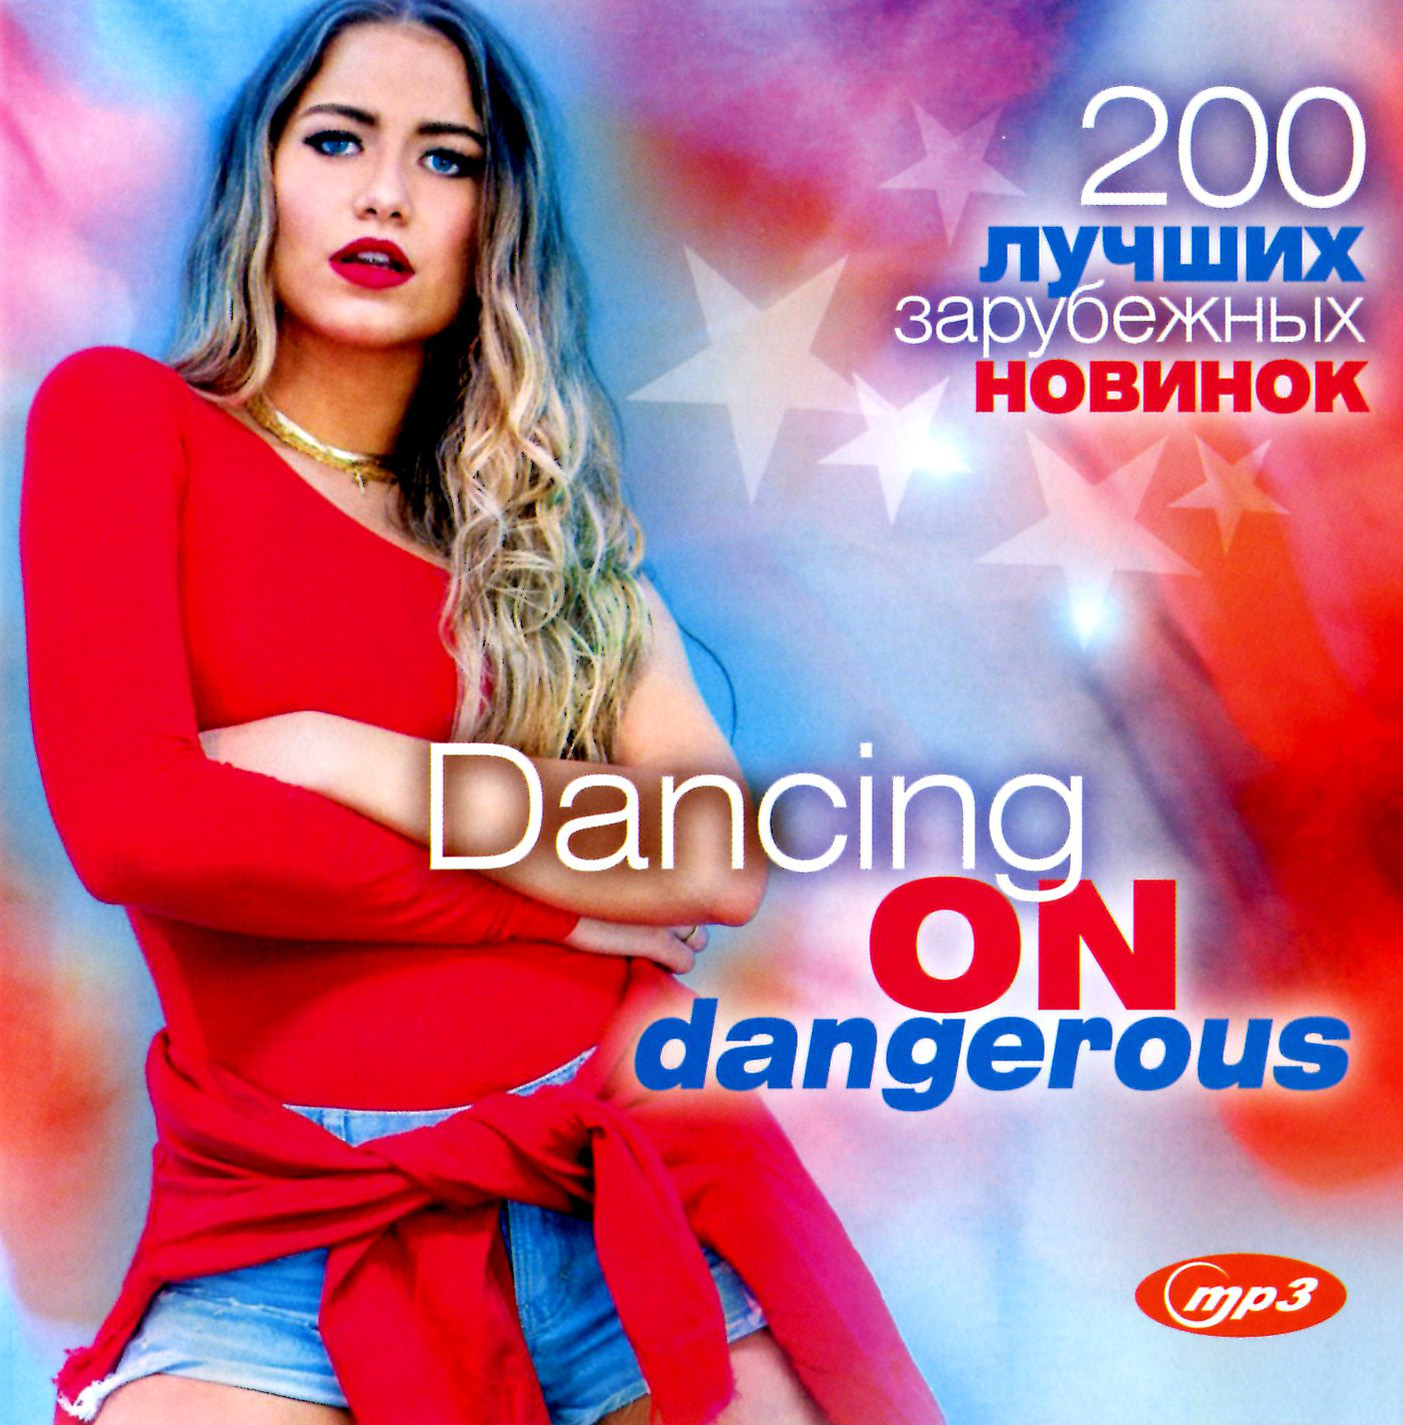 Dancing on Dangerous - 200 лучших зарубежных новинок [mp3]